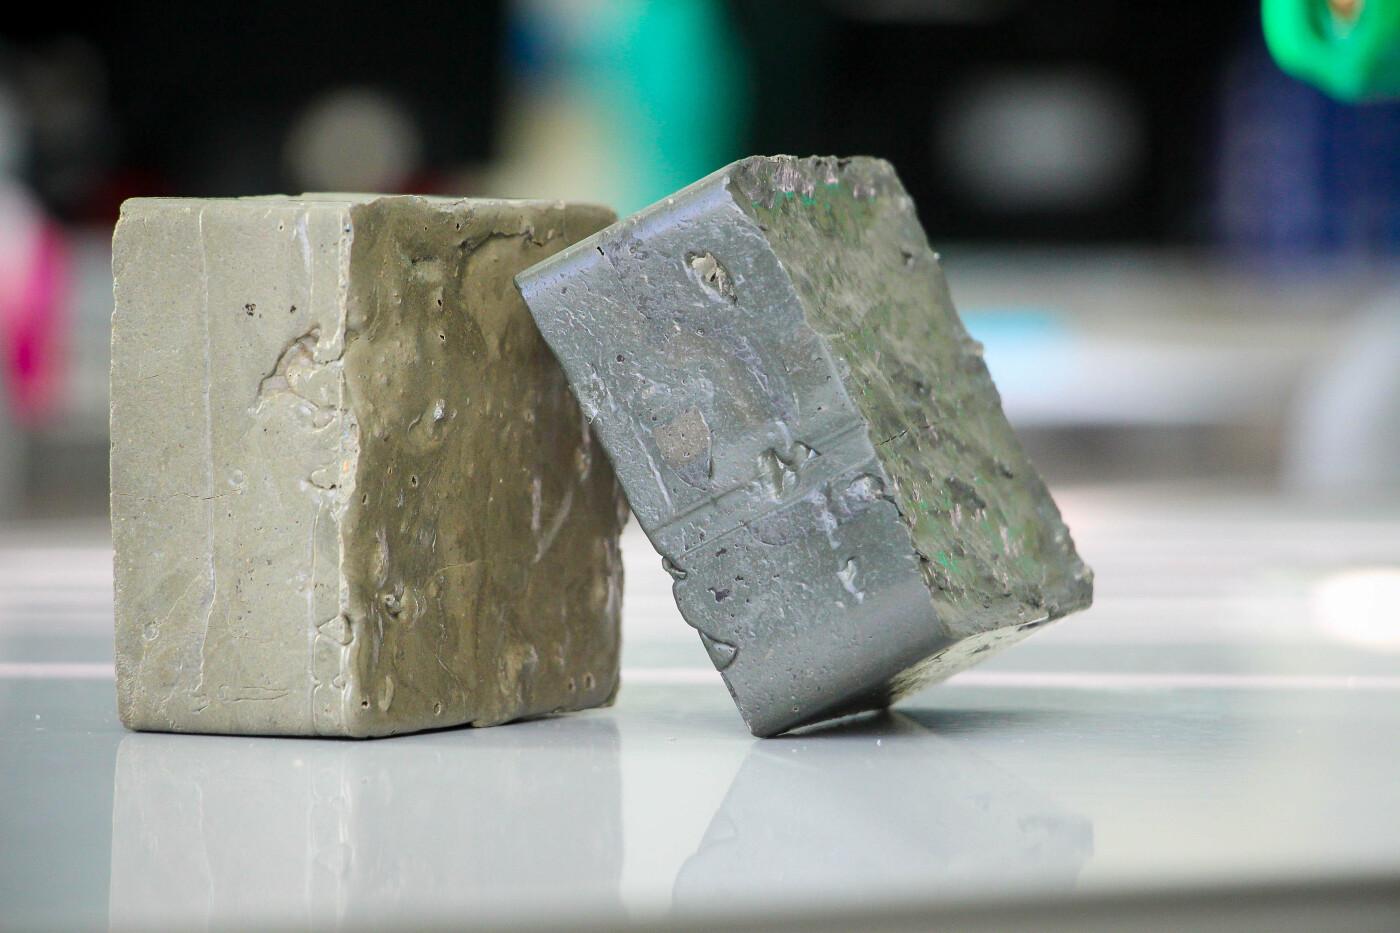 В Атырау старшеклассник изобрёл кирпич из пластика (фото), фото-1